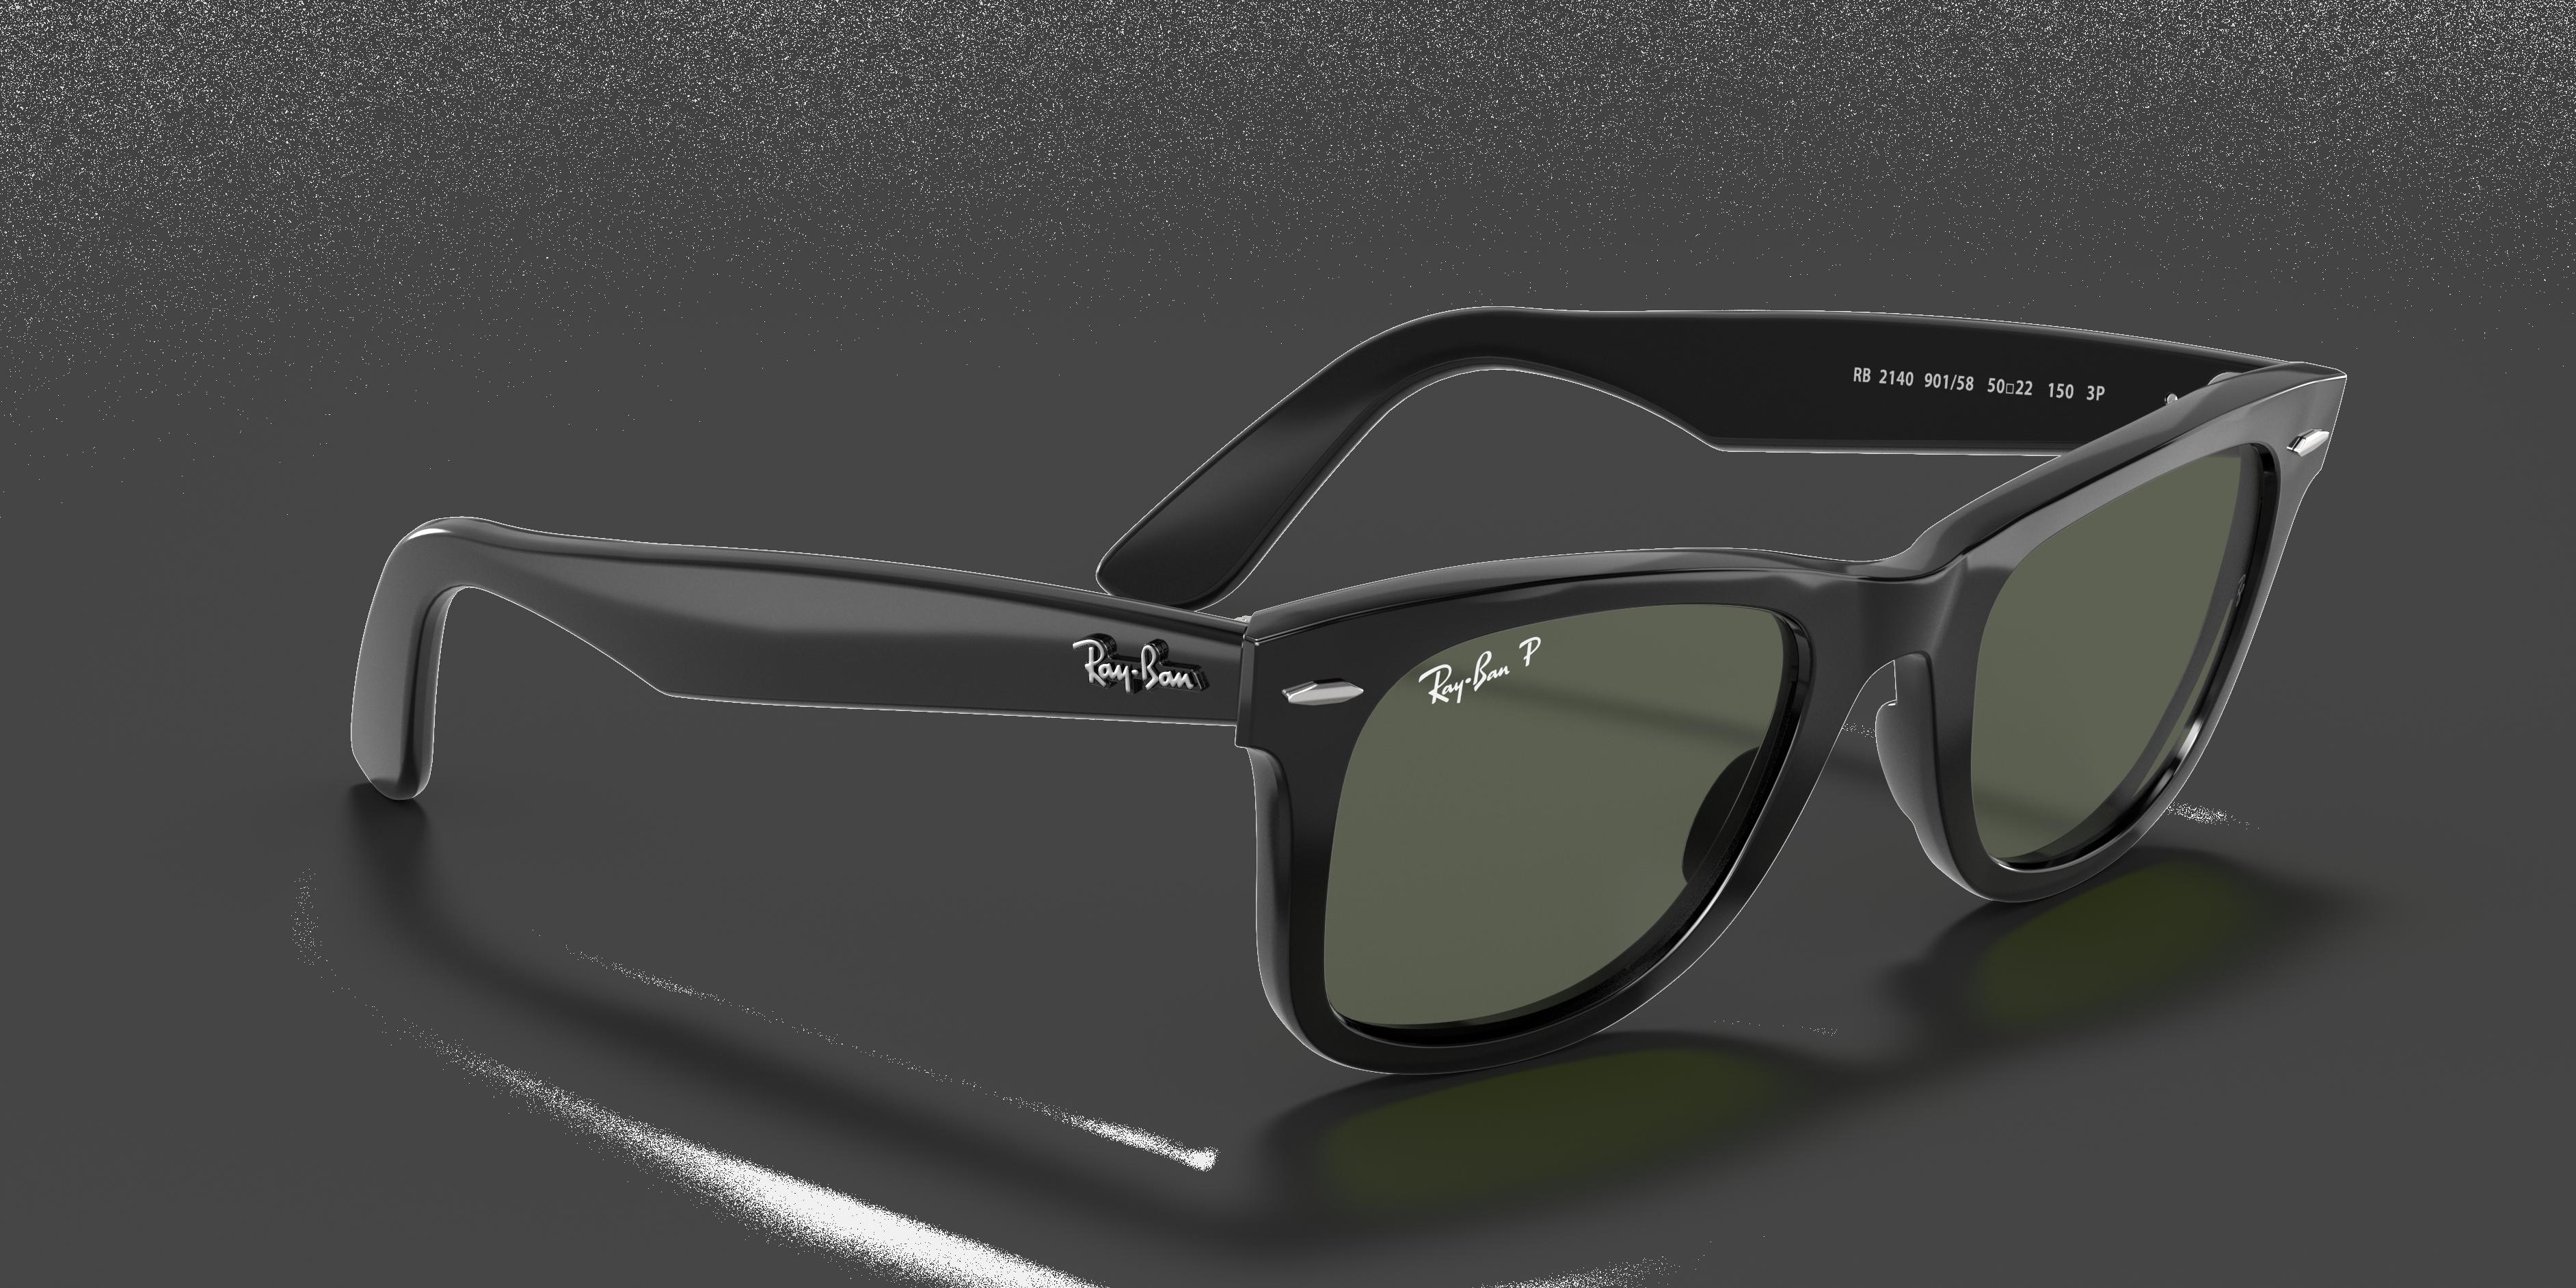 Sunglasses Retro Wayfarer Transparent with Sideburns Light Blue Green